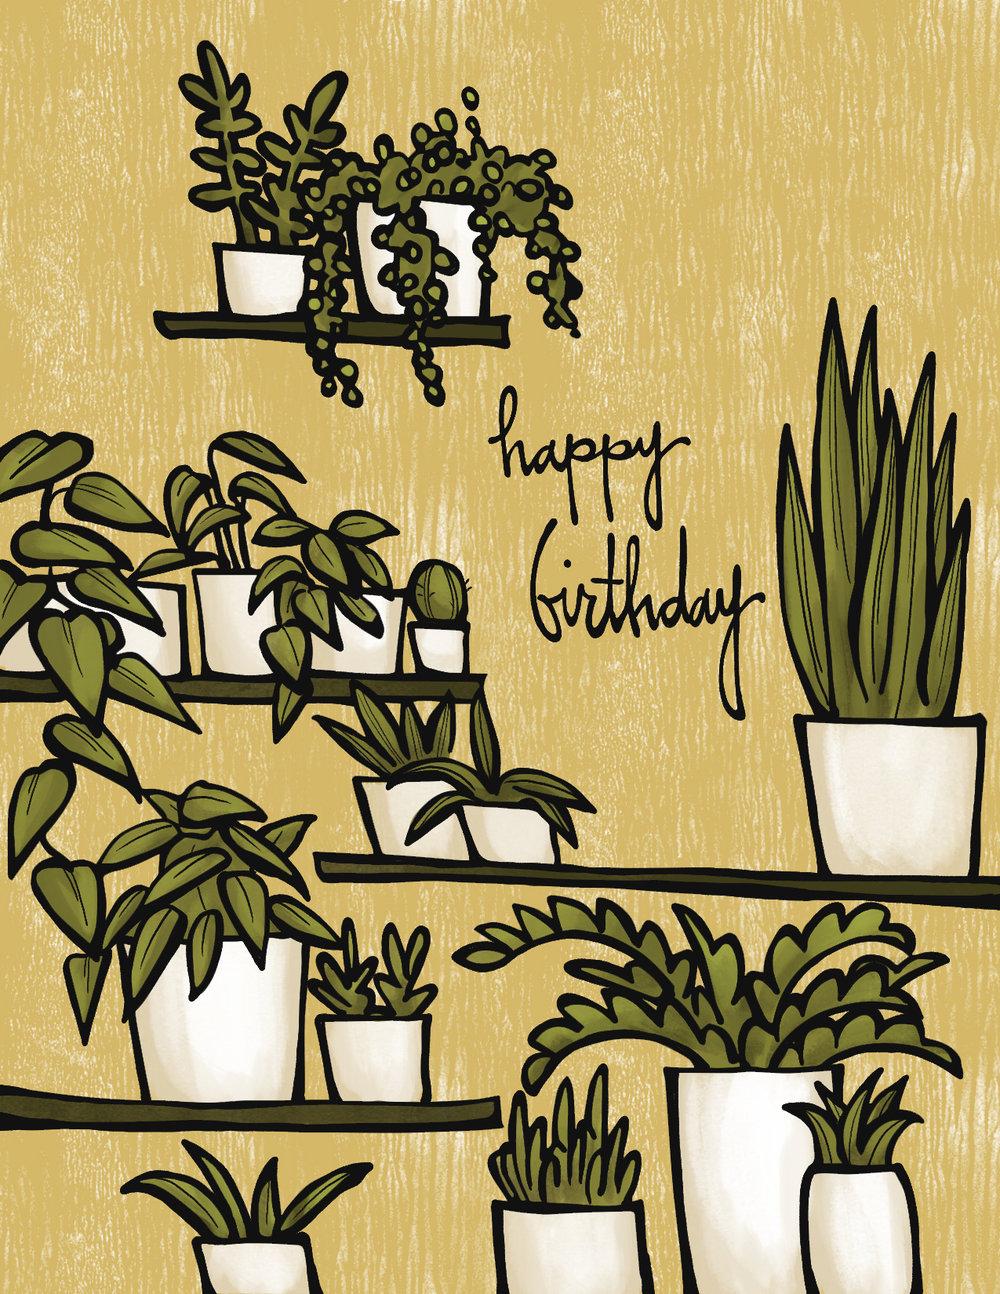 House Plant Birthday.jpg